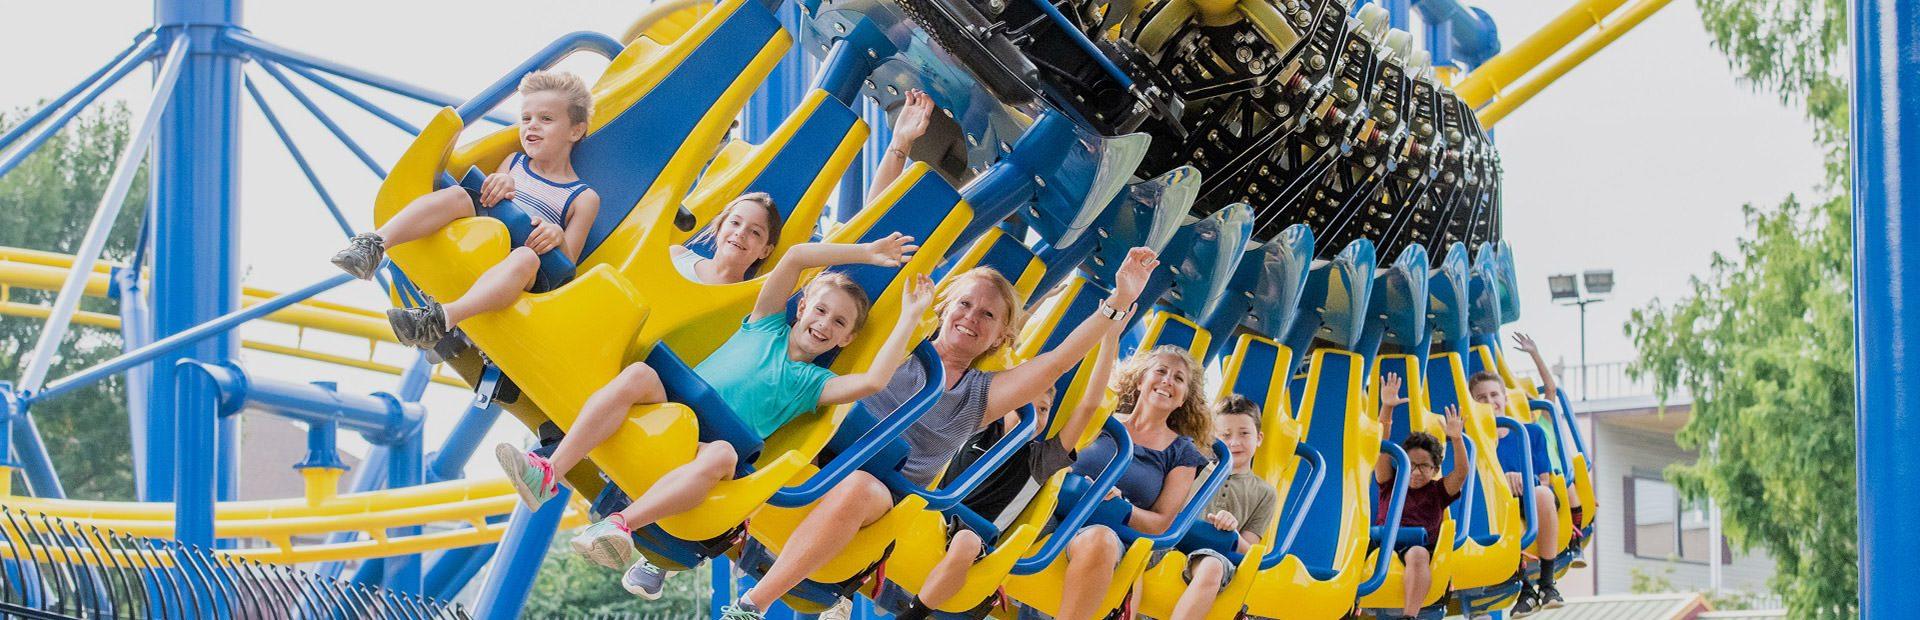 Dutch Wonderland Amusement park ride